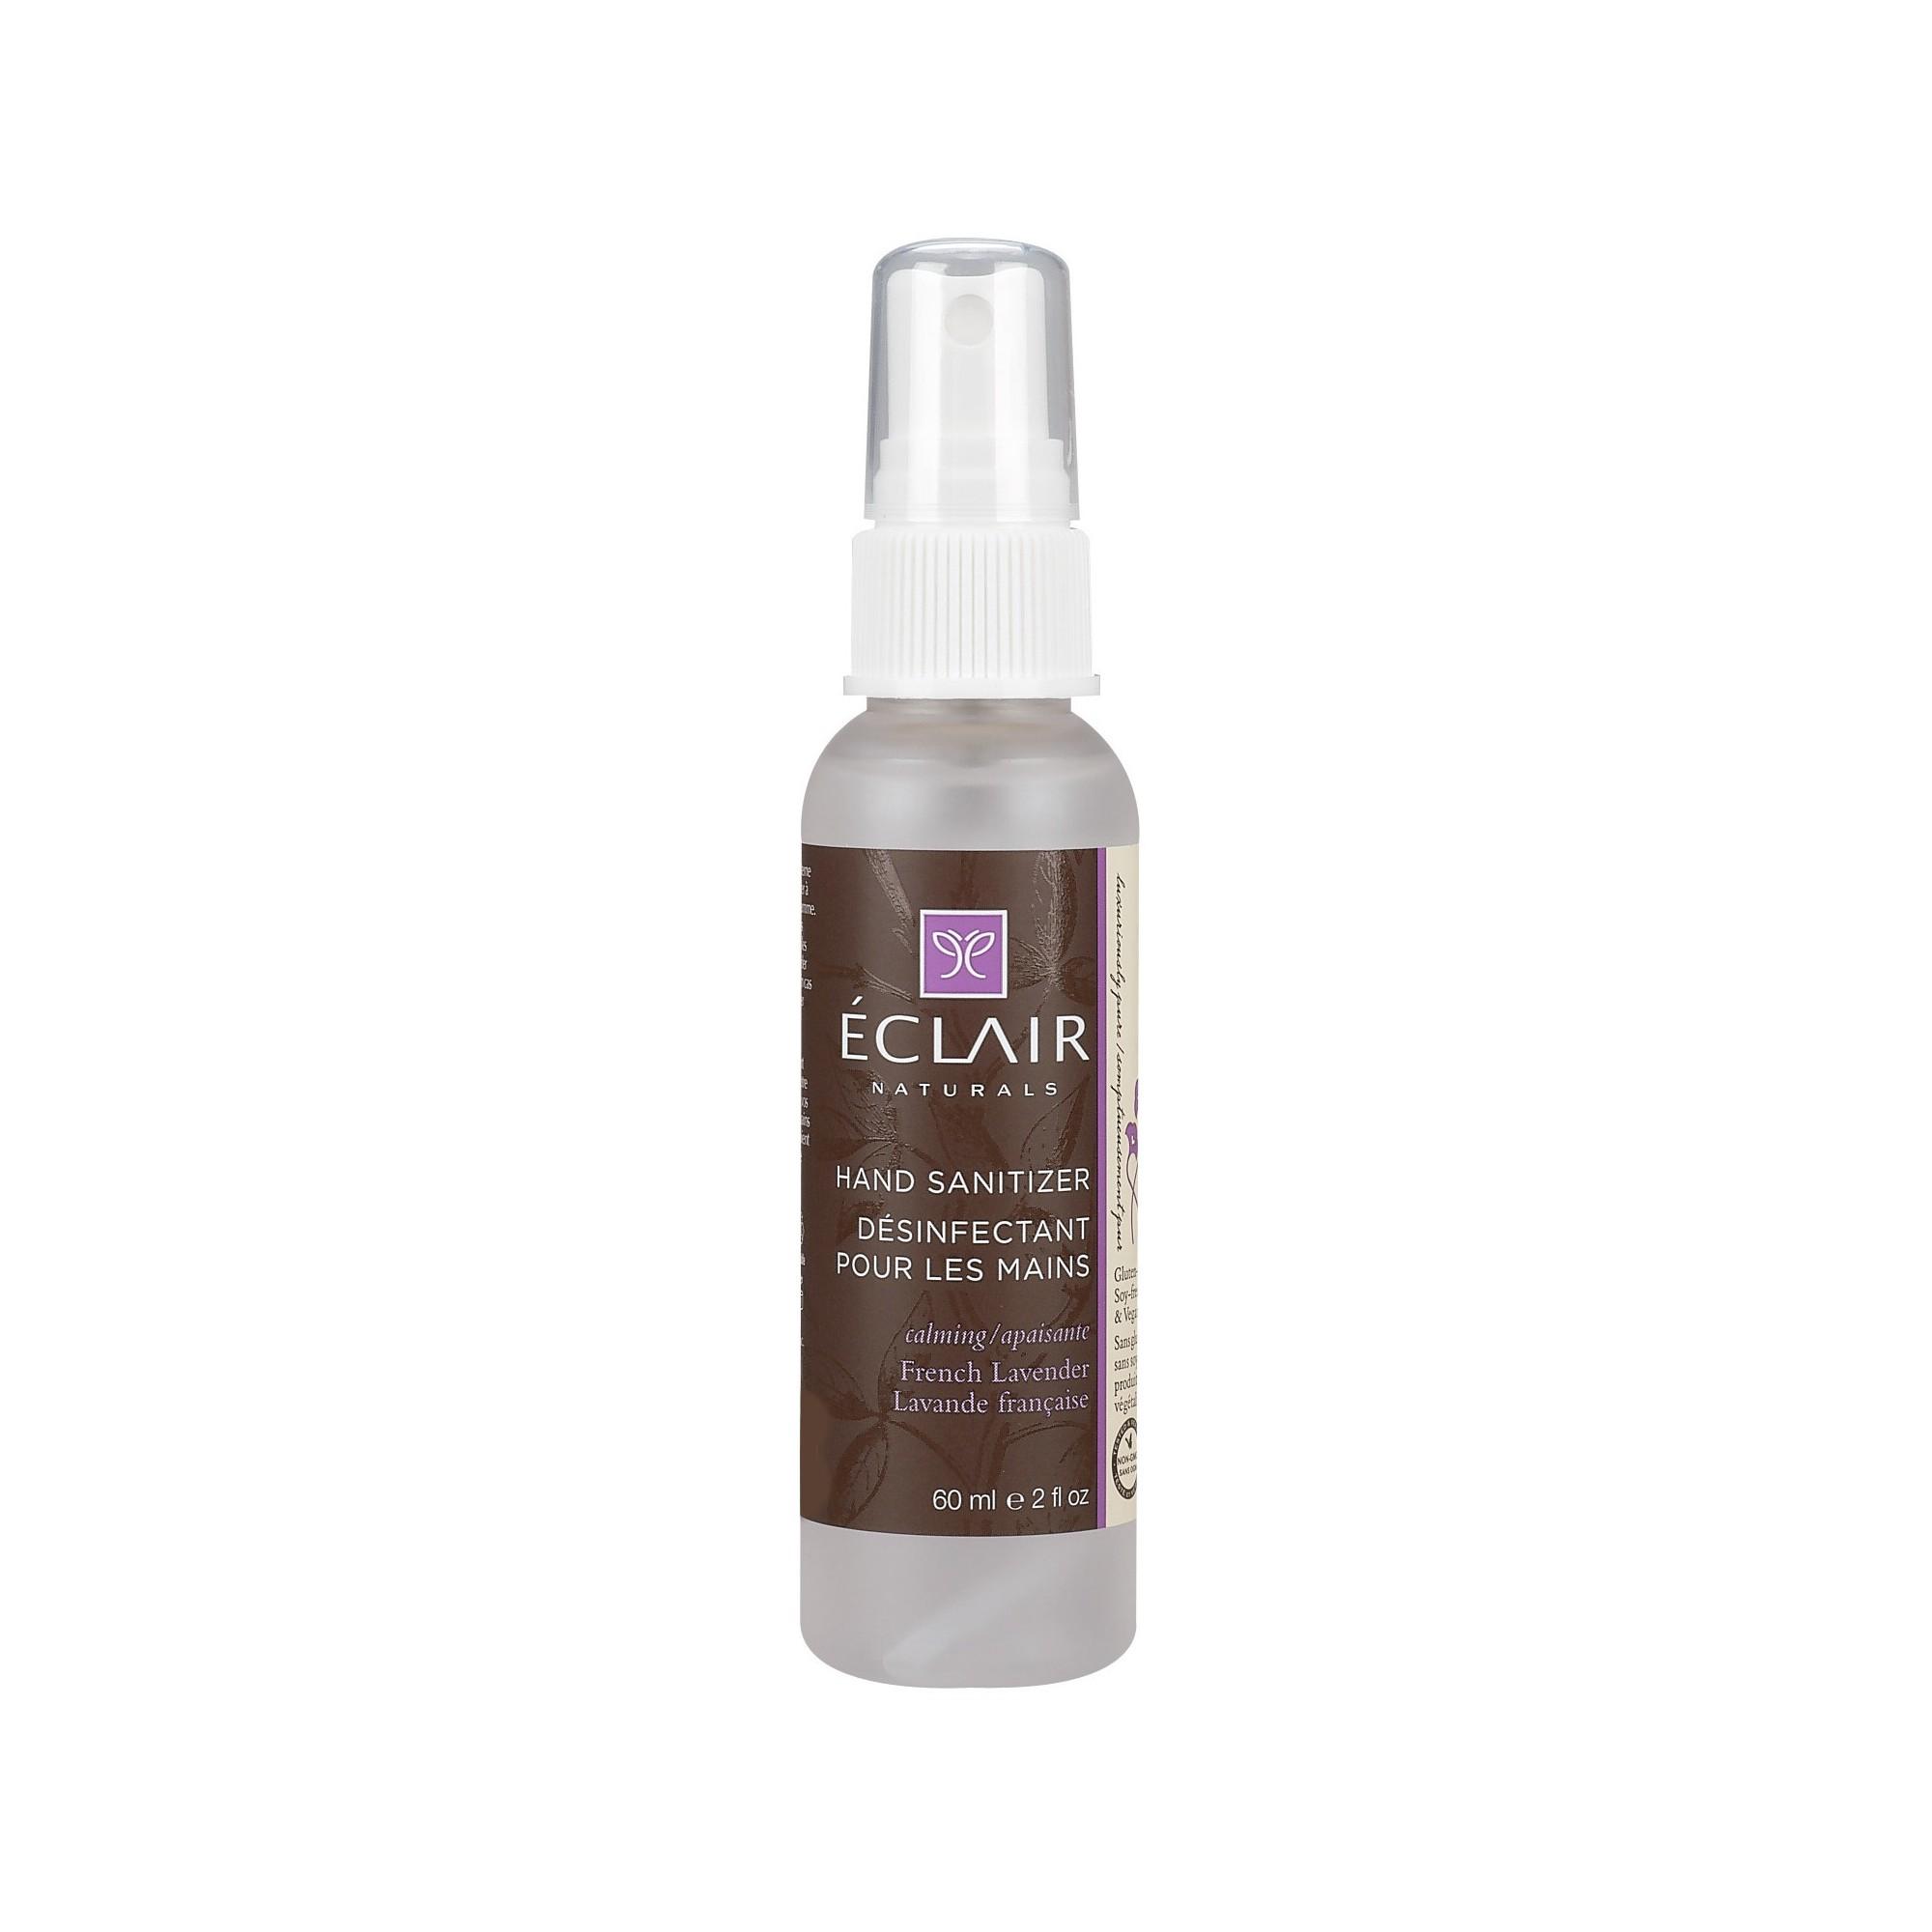 Diy Hand Sanitizer With Lavender Aloe Natural Hand Sanitizer